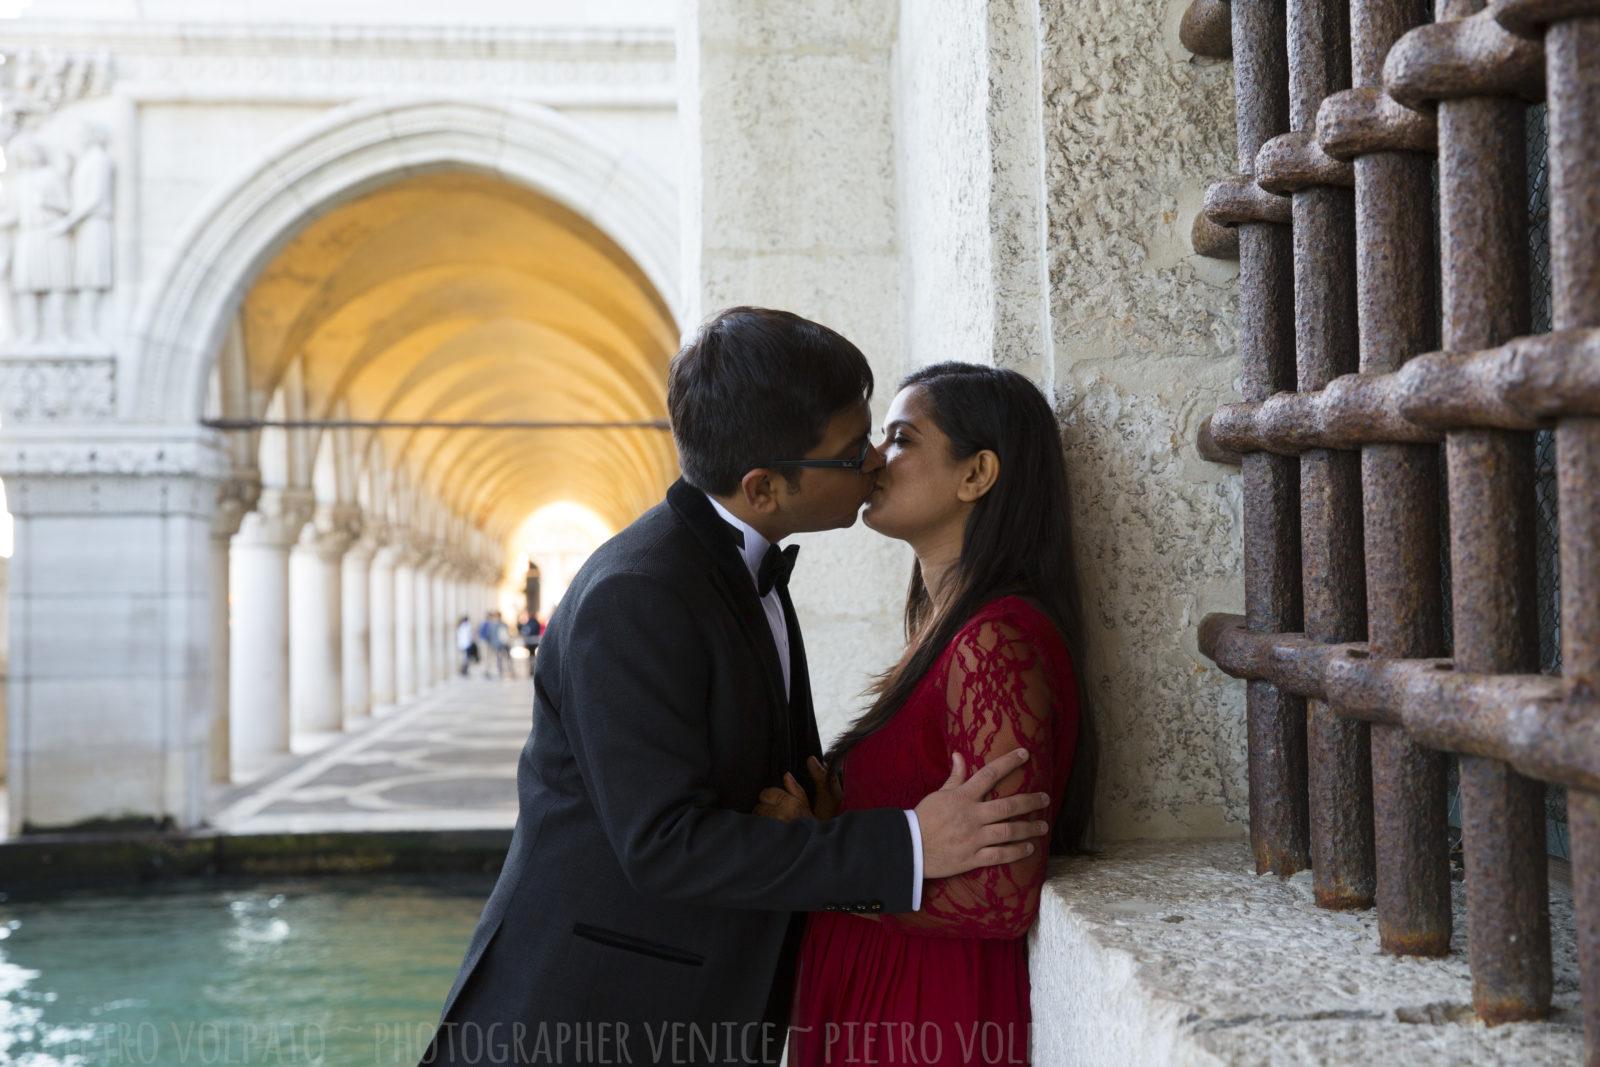 photographer-venice-italy-honeymoon-photo-shoot-romantic-fun-walking-tour-20160429_02